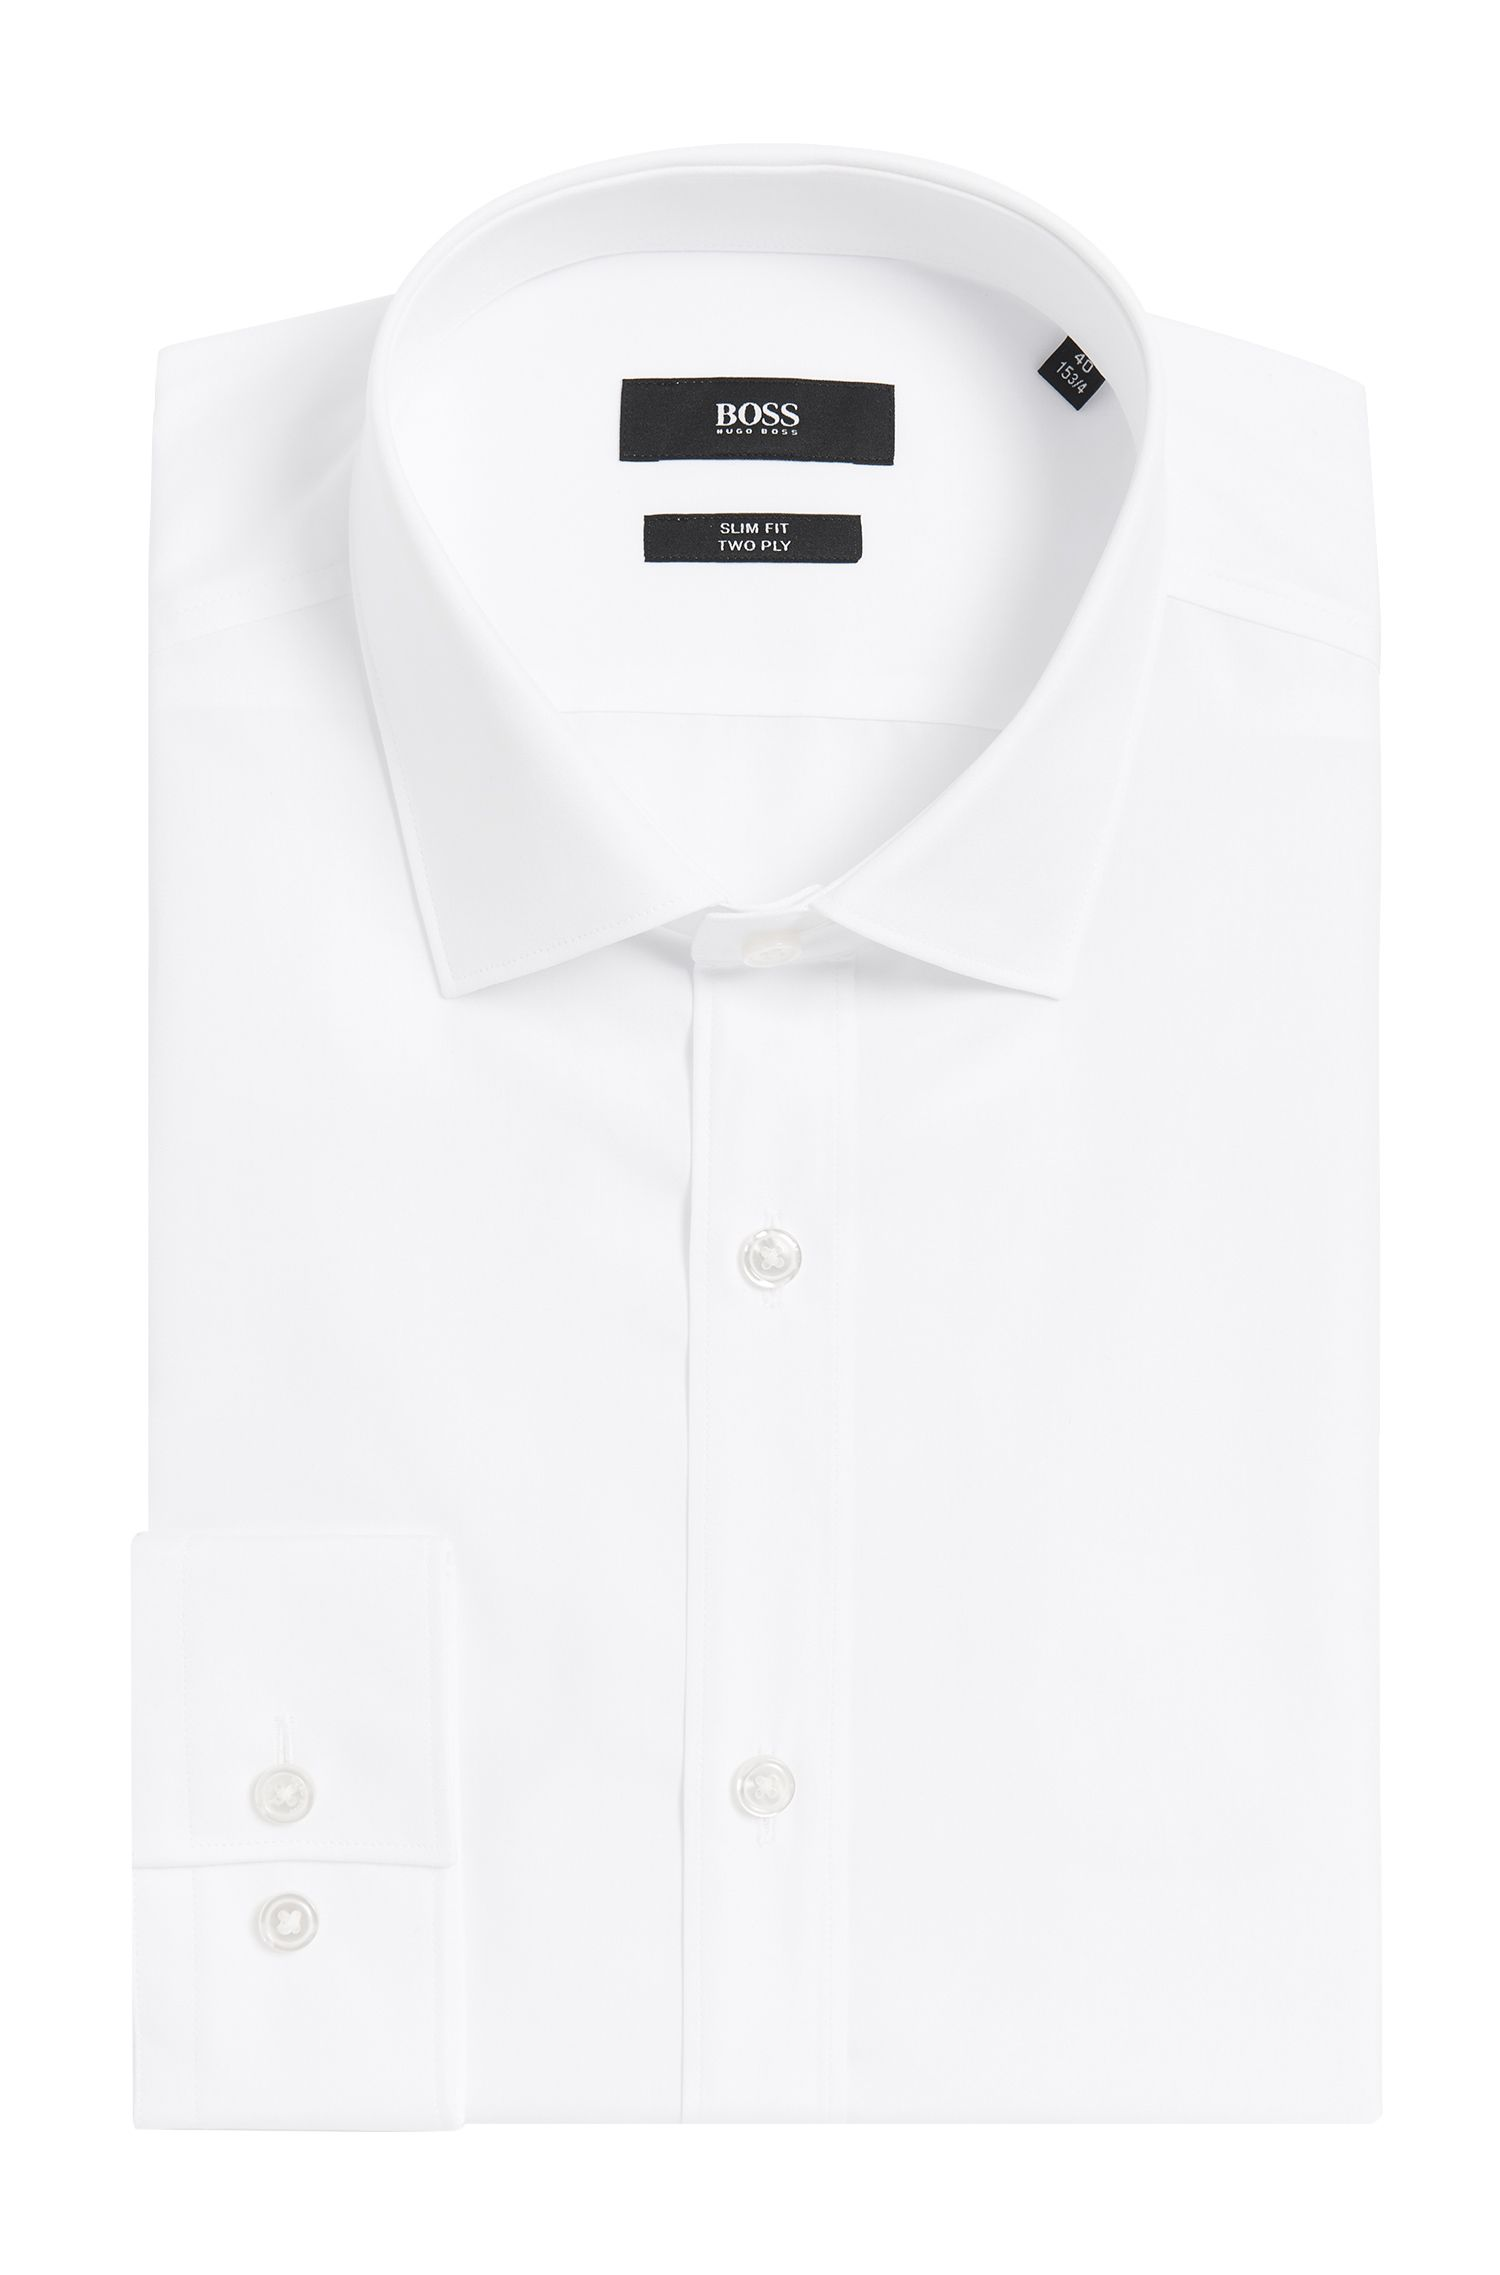 'Isaak' | Slim Fit, 2-Ply Italian Cotton Dress Shirt